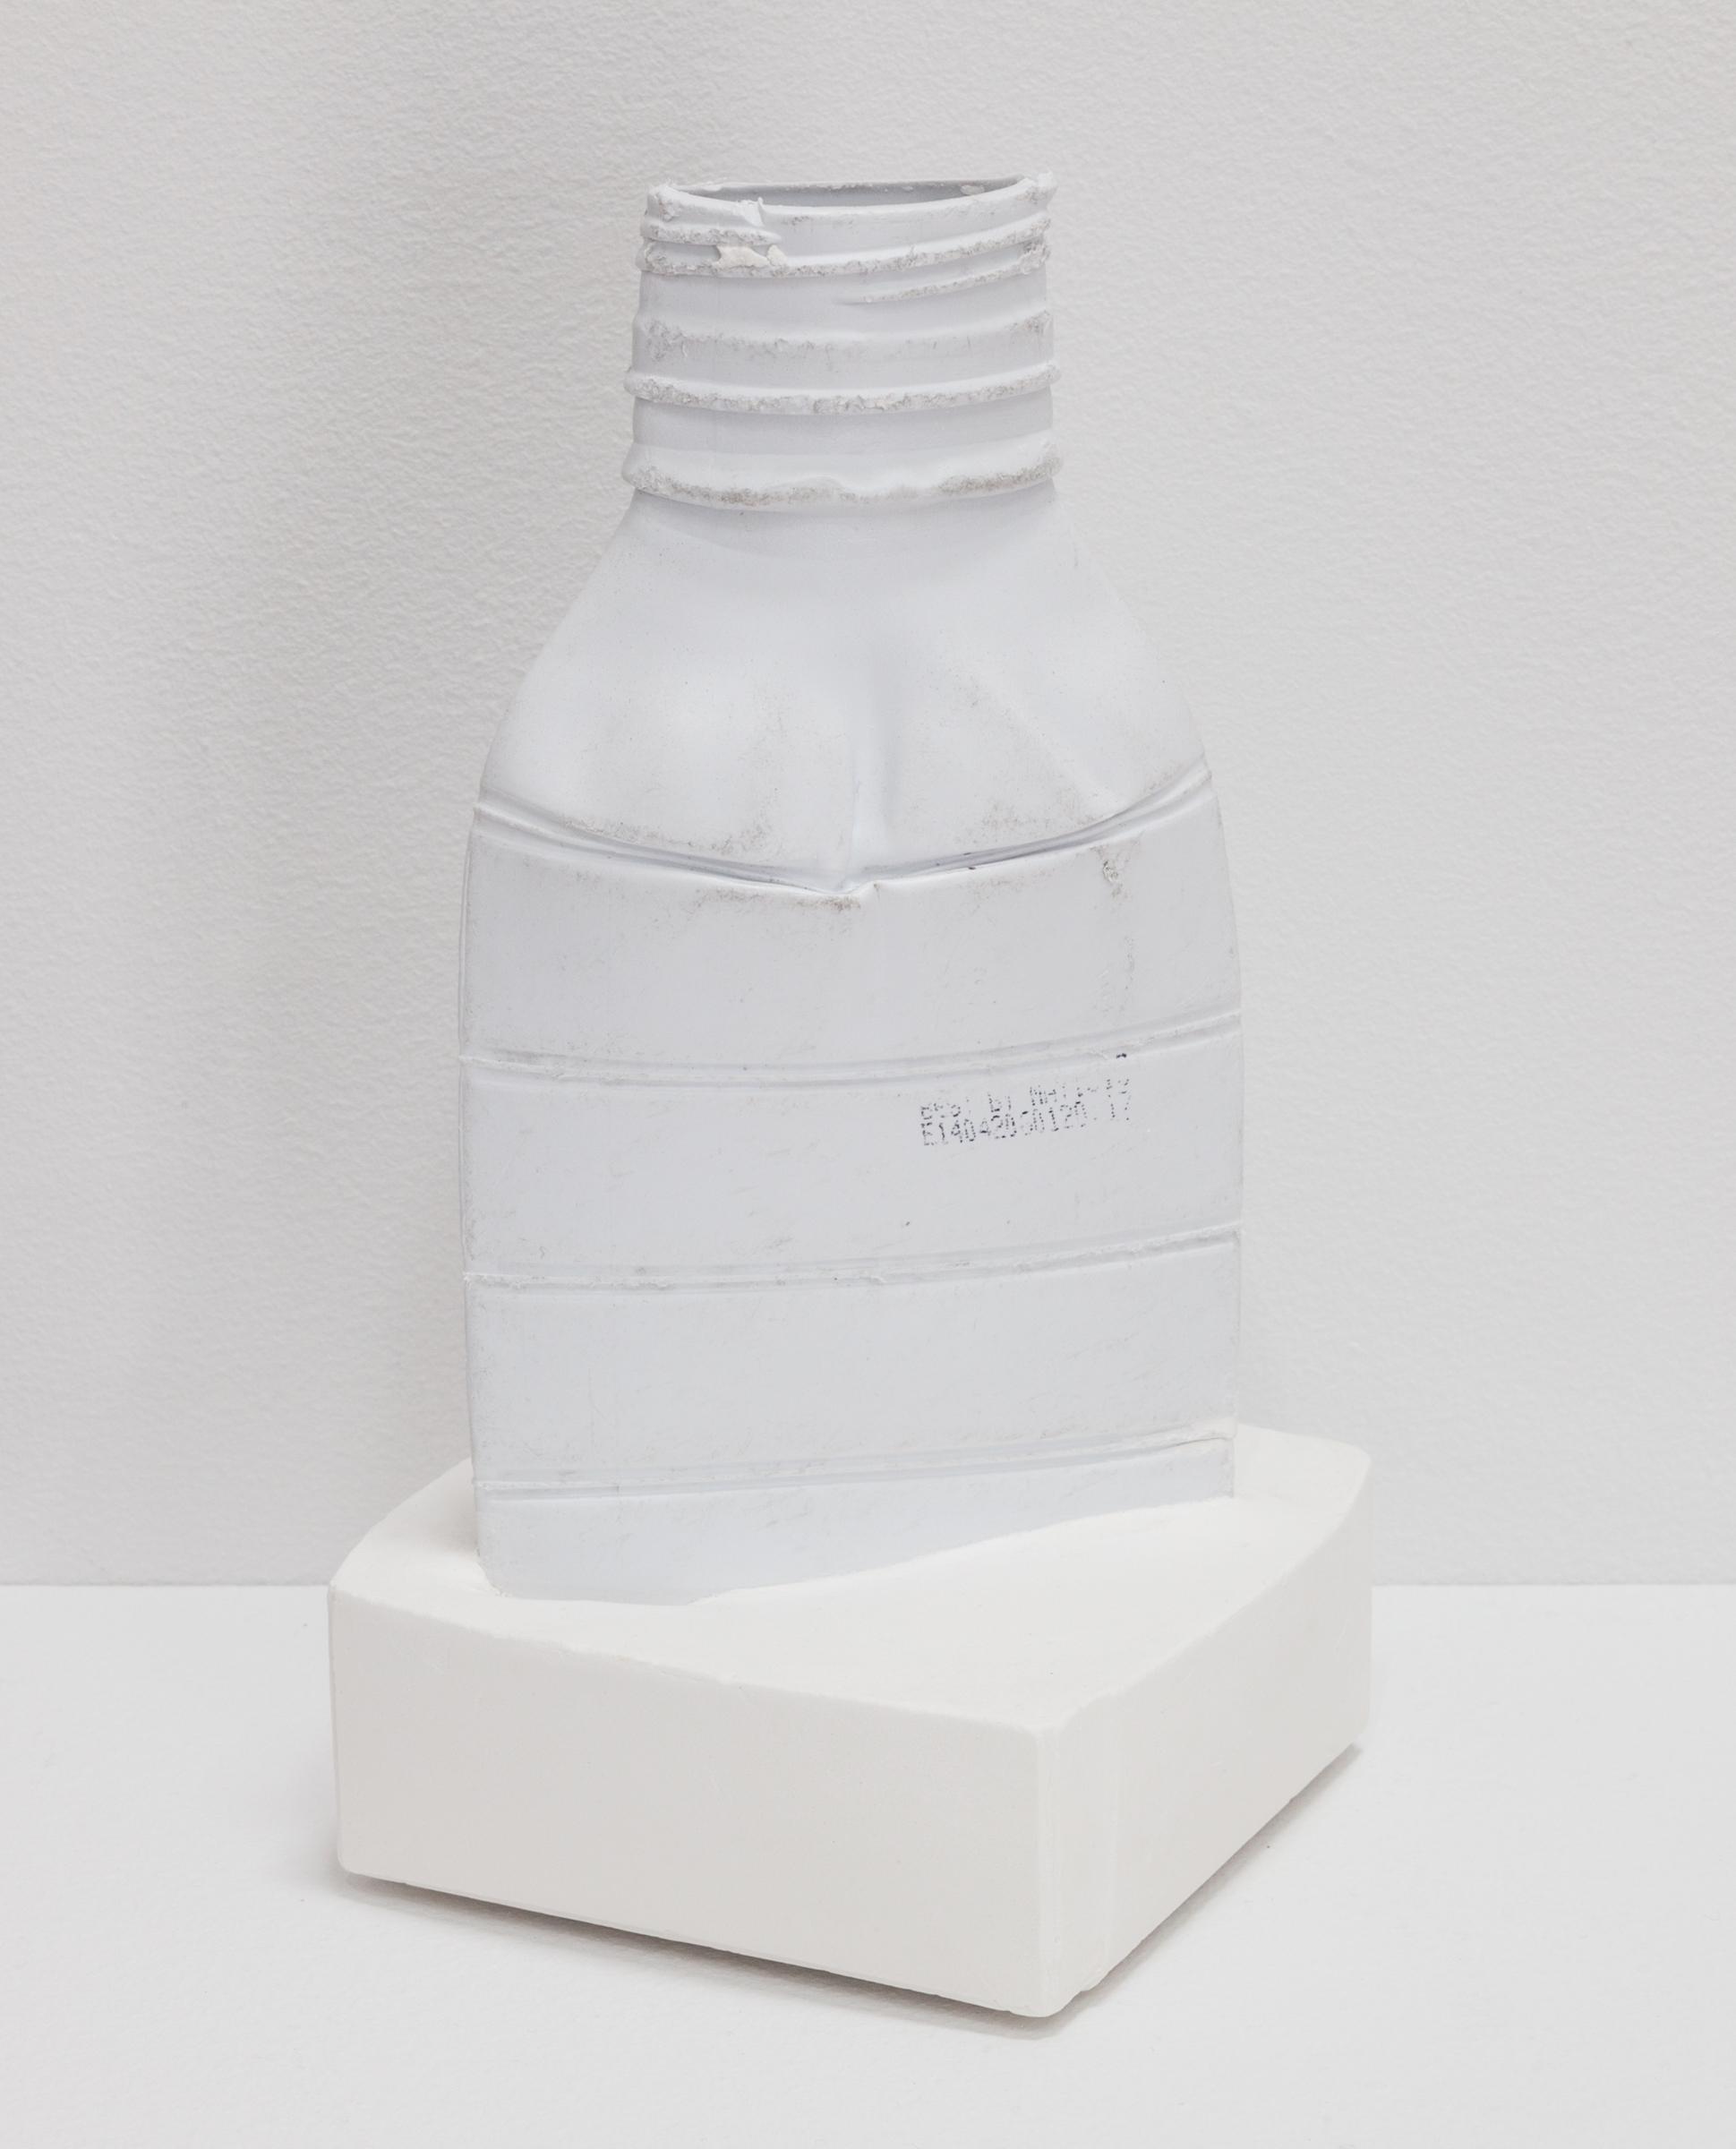 Deborah Hede,  White Plastic Bottle (large) , 2014, plastic bottle, plaster, 8 ¼ × 4 × 4 in